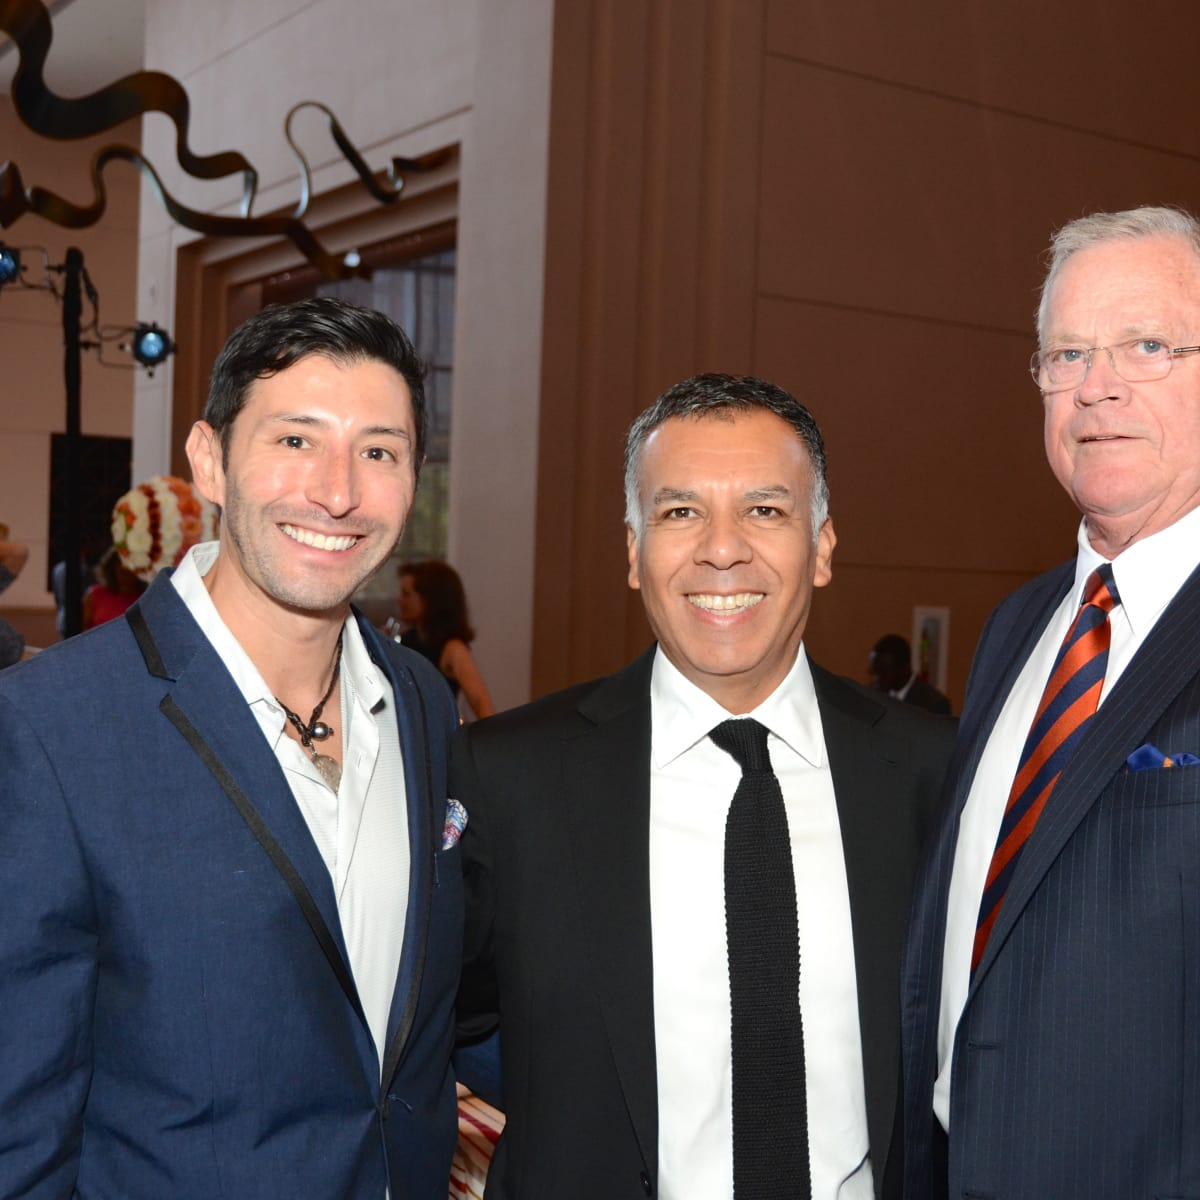 News, shelby, Legacy luncheon, Sept. 2015, Jorge Cantu, Tony Bravo, Richard Werner